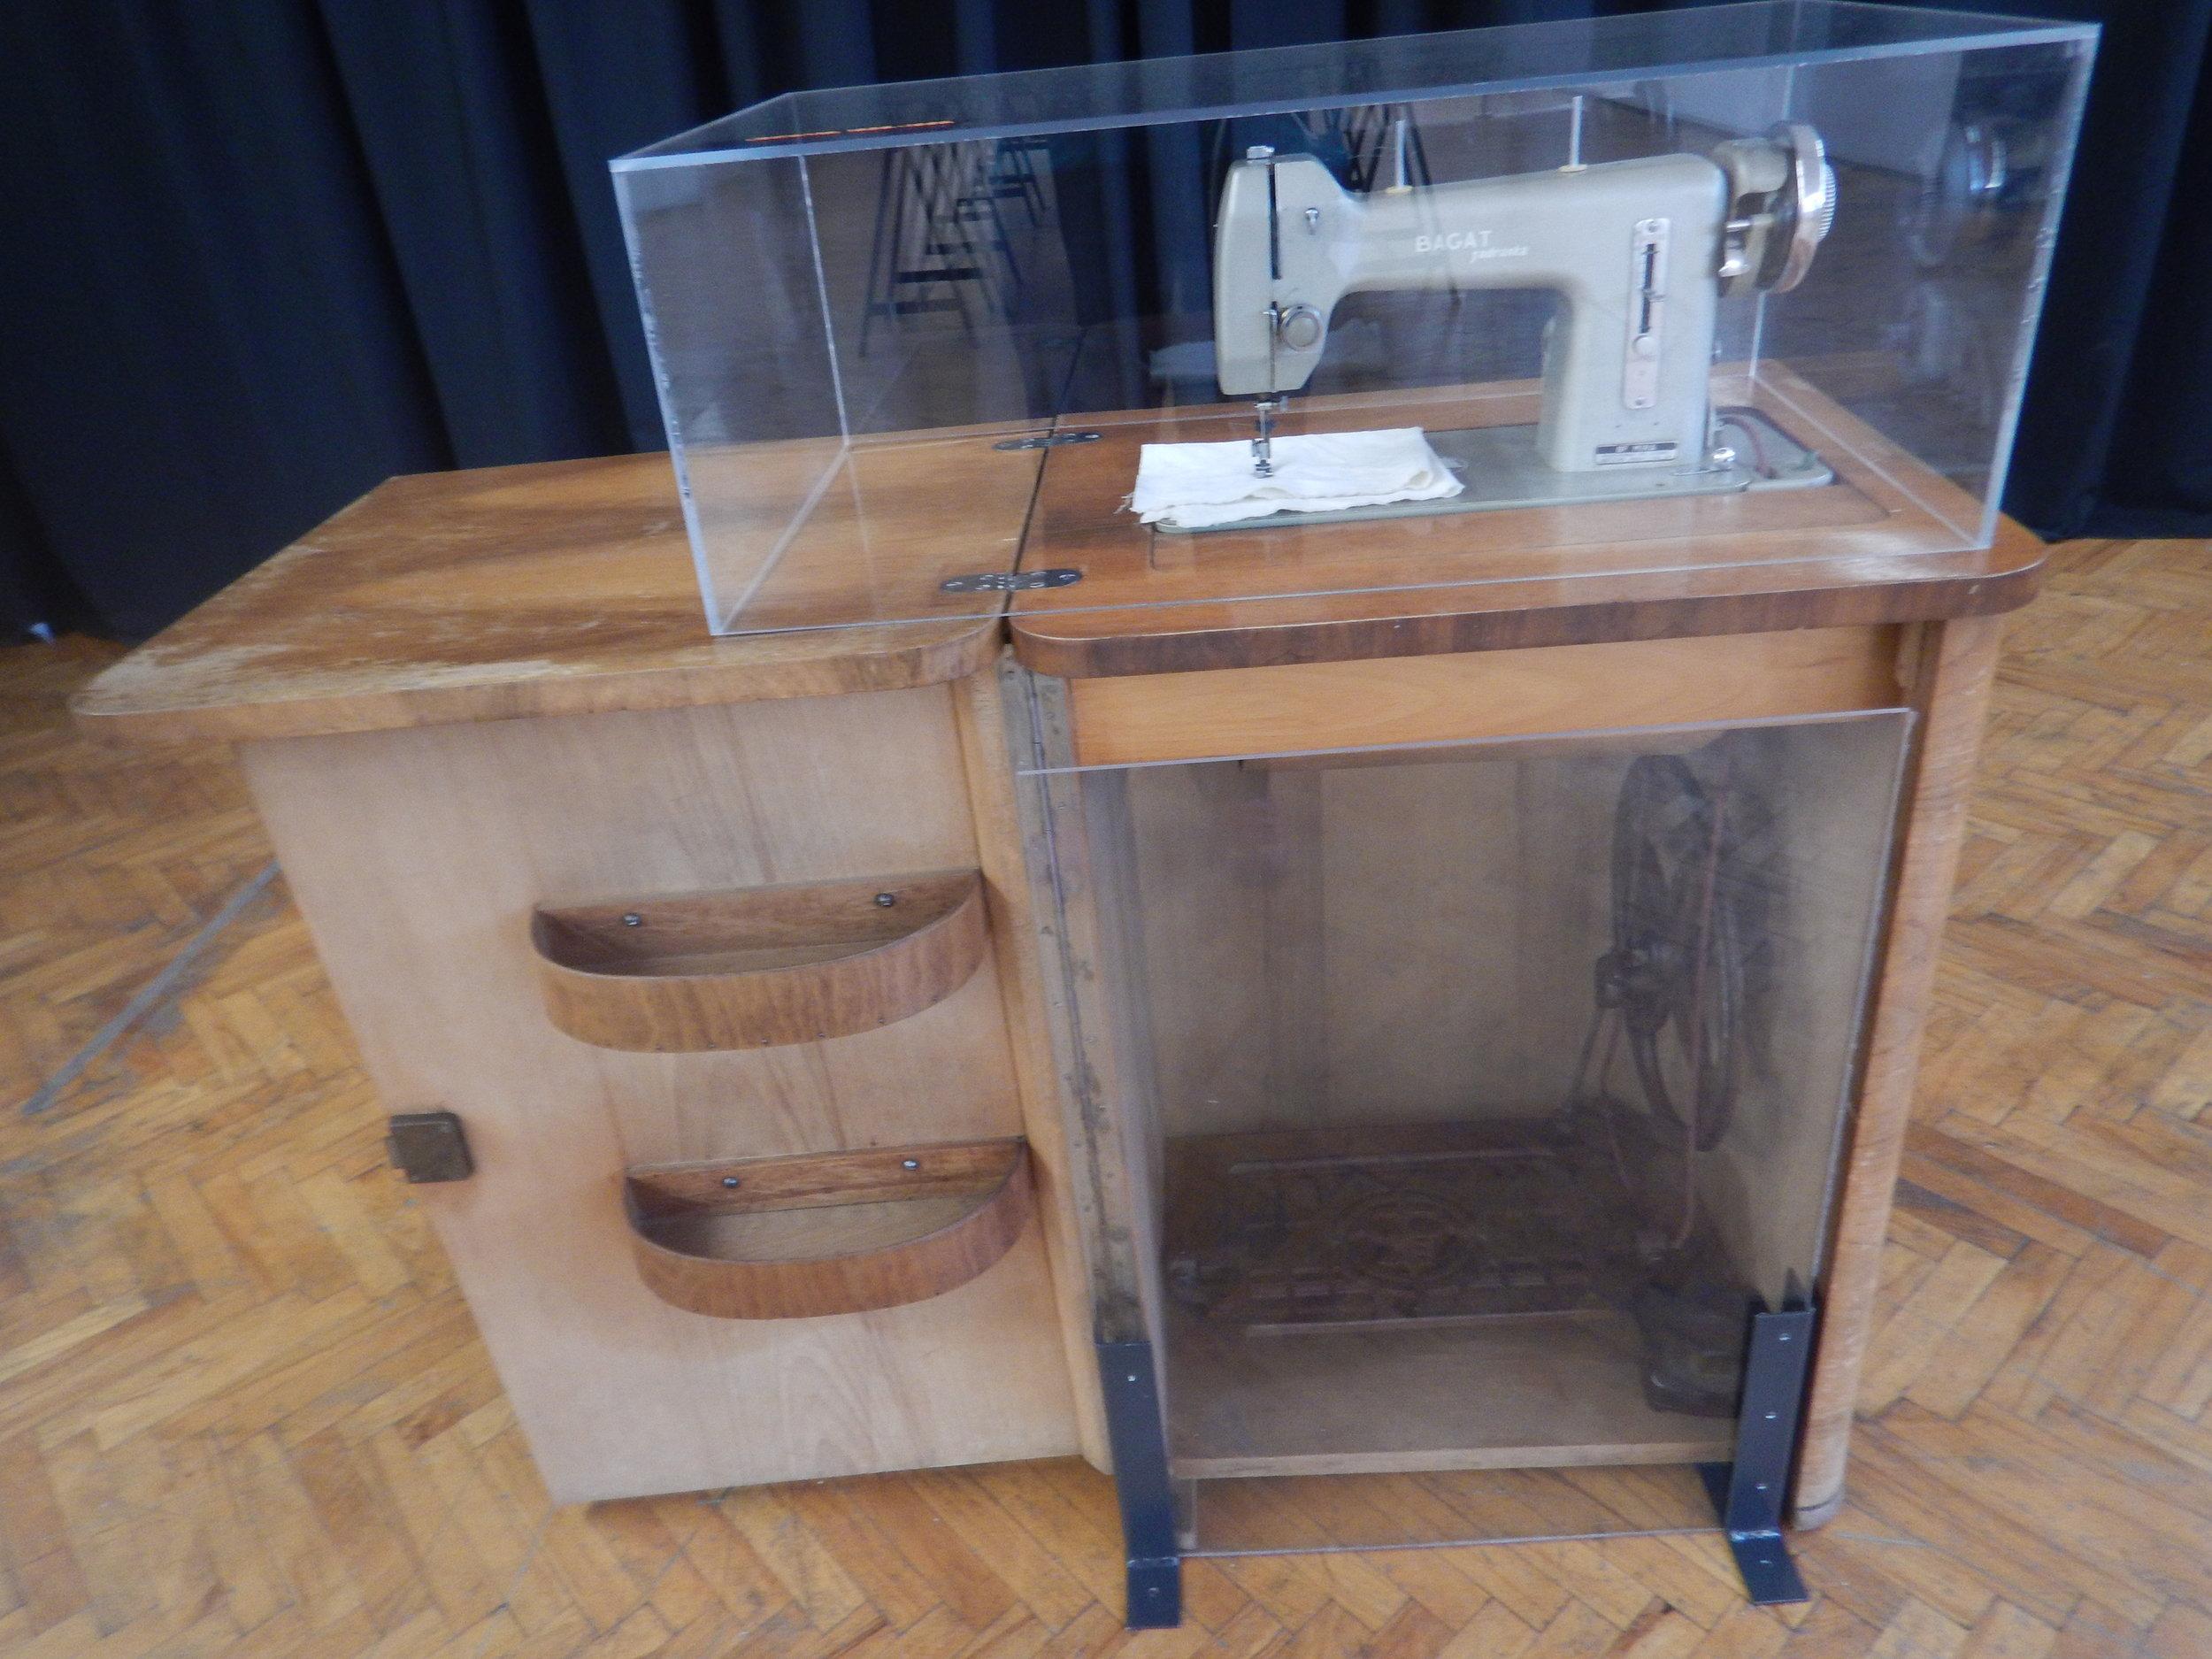 Croatian version of a treadle Singer sewing machine.